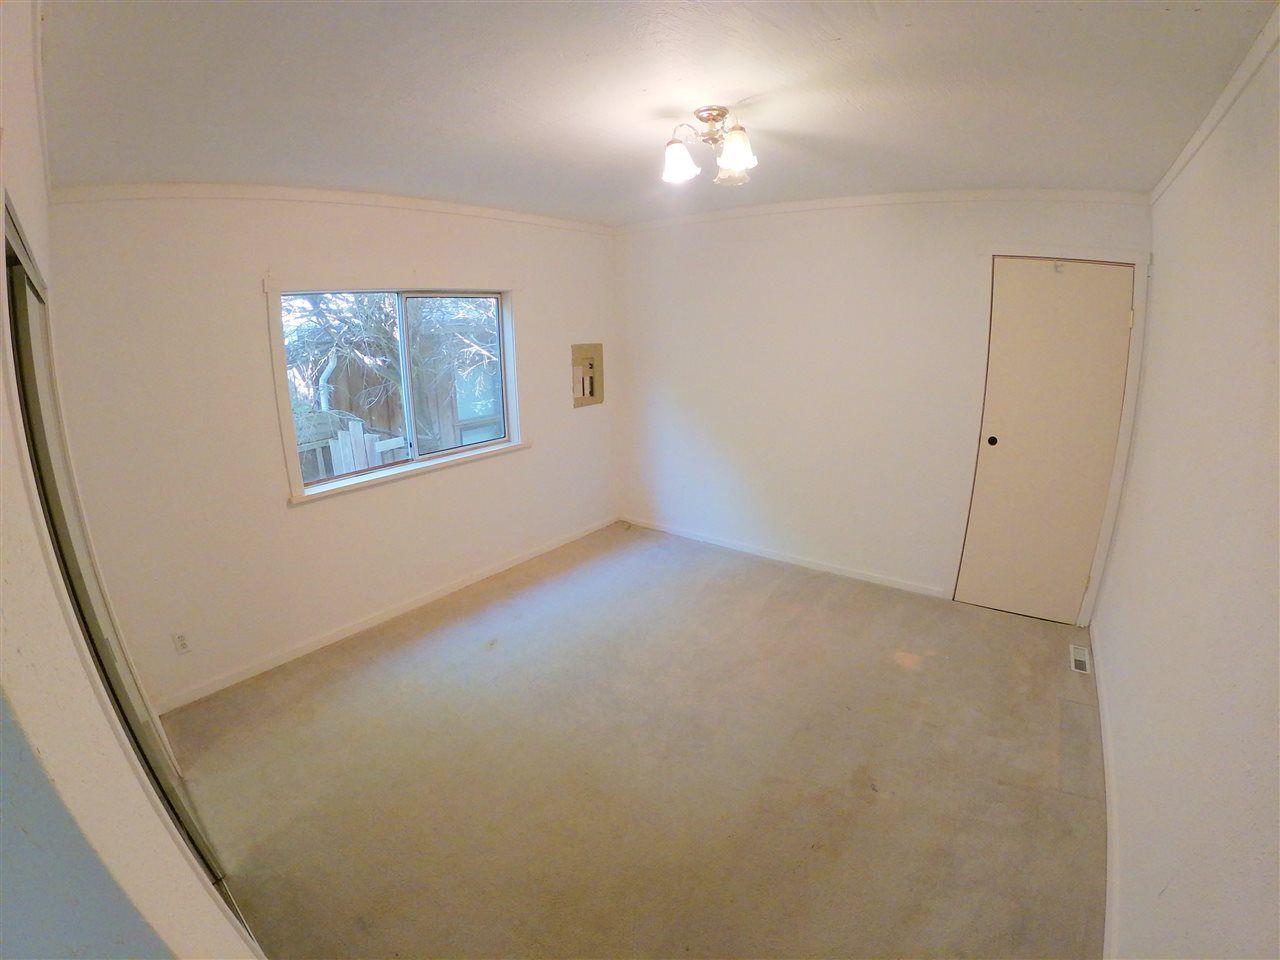 Photo 13: Photos: 5702 MEDUSA Street in Sechelt: Sechelt District House for sale (Sunshine Coast)  : MLS®# R2323721